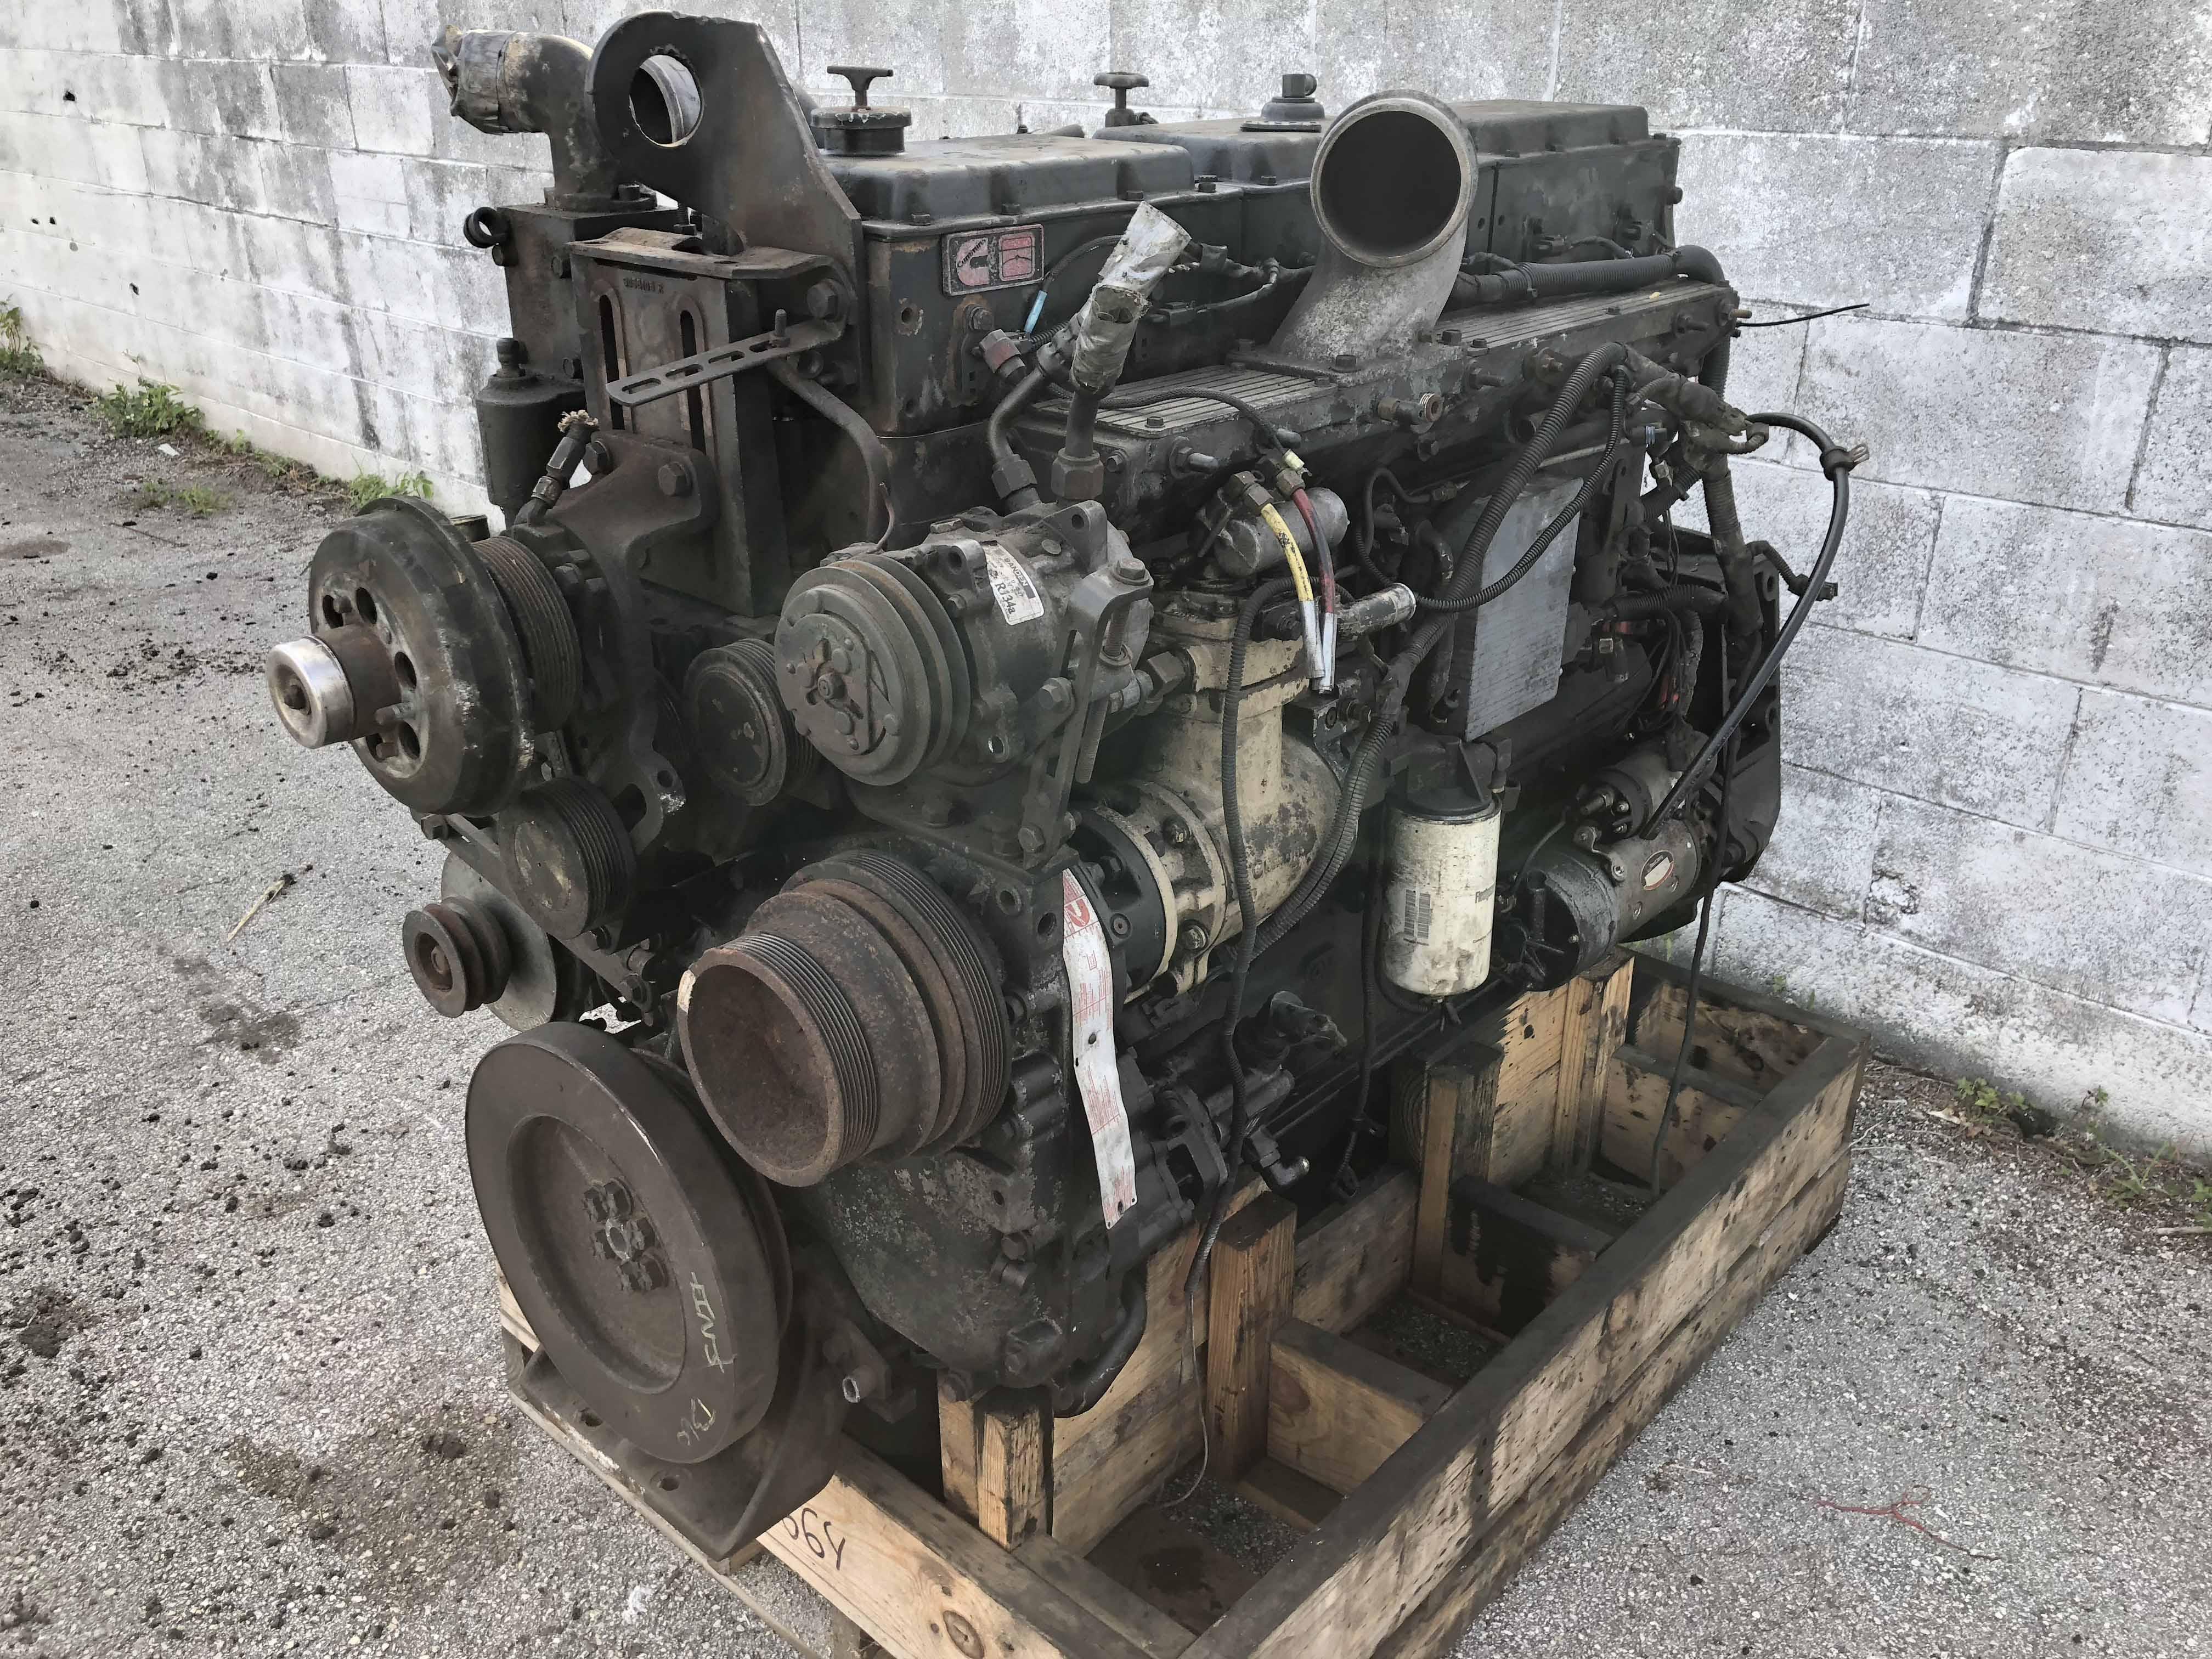 5.9 L Cummins For Sale >> (Reconditioned) Cummins N14 Celect Engine For Sale #114696664 - D&D Diesel